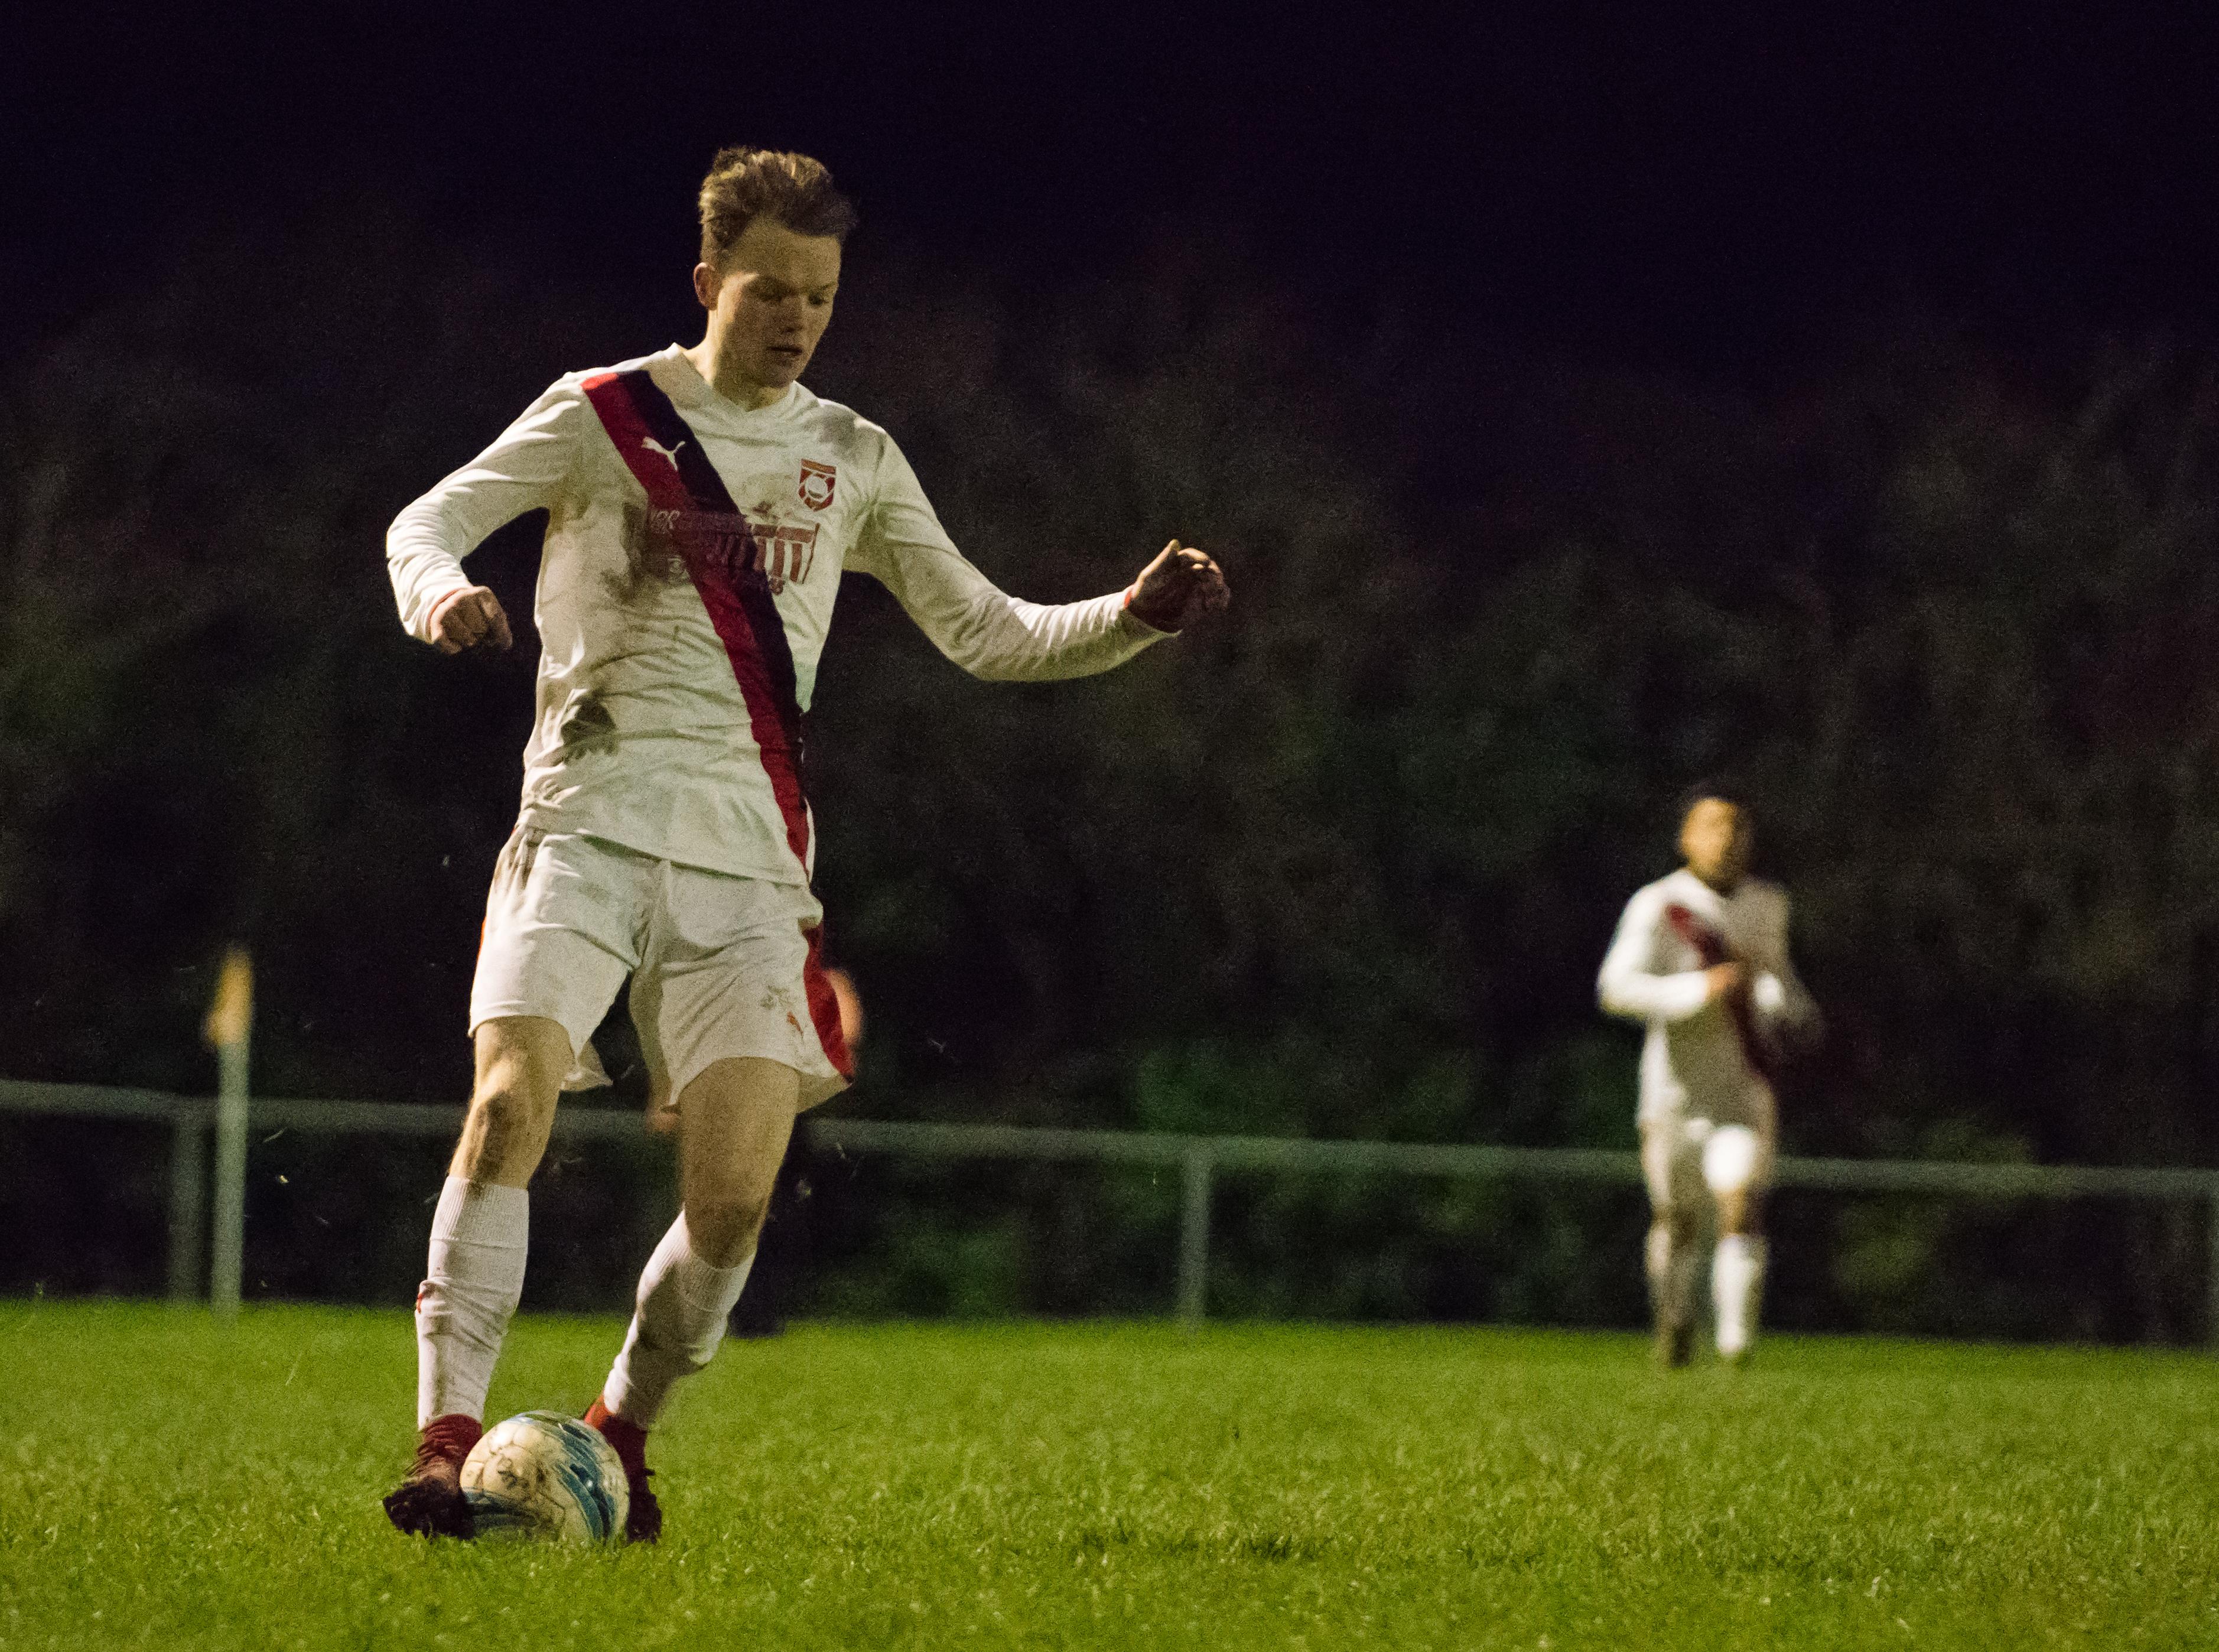 Mile Oak U21s vs Southwick FC U21s 14.12.17 20